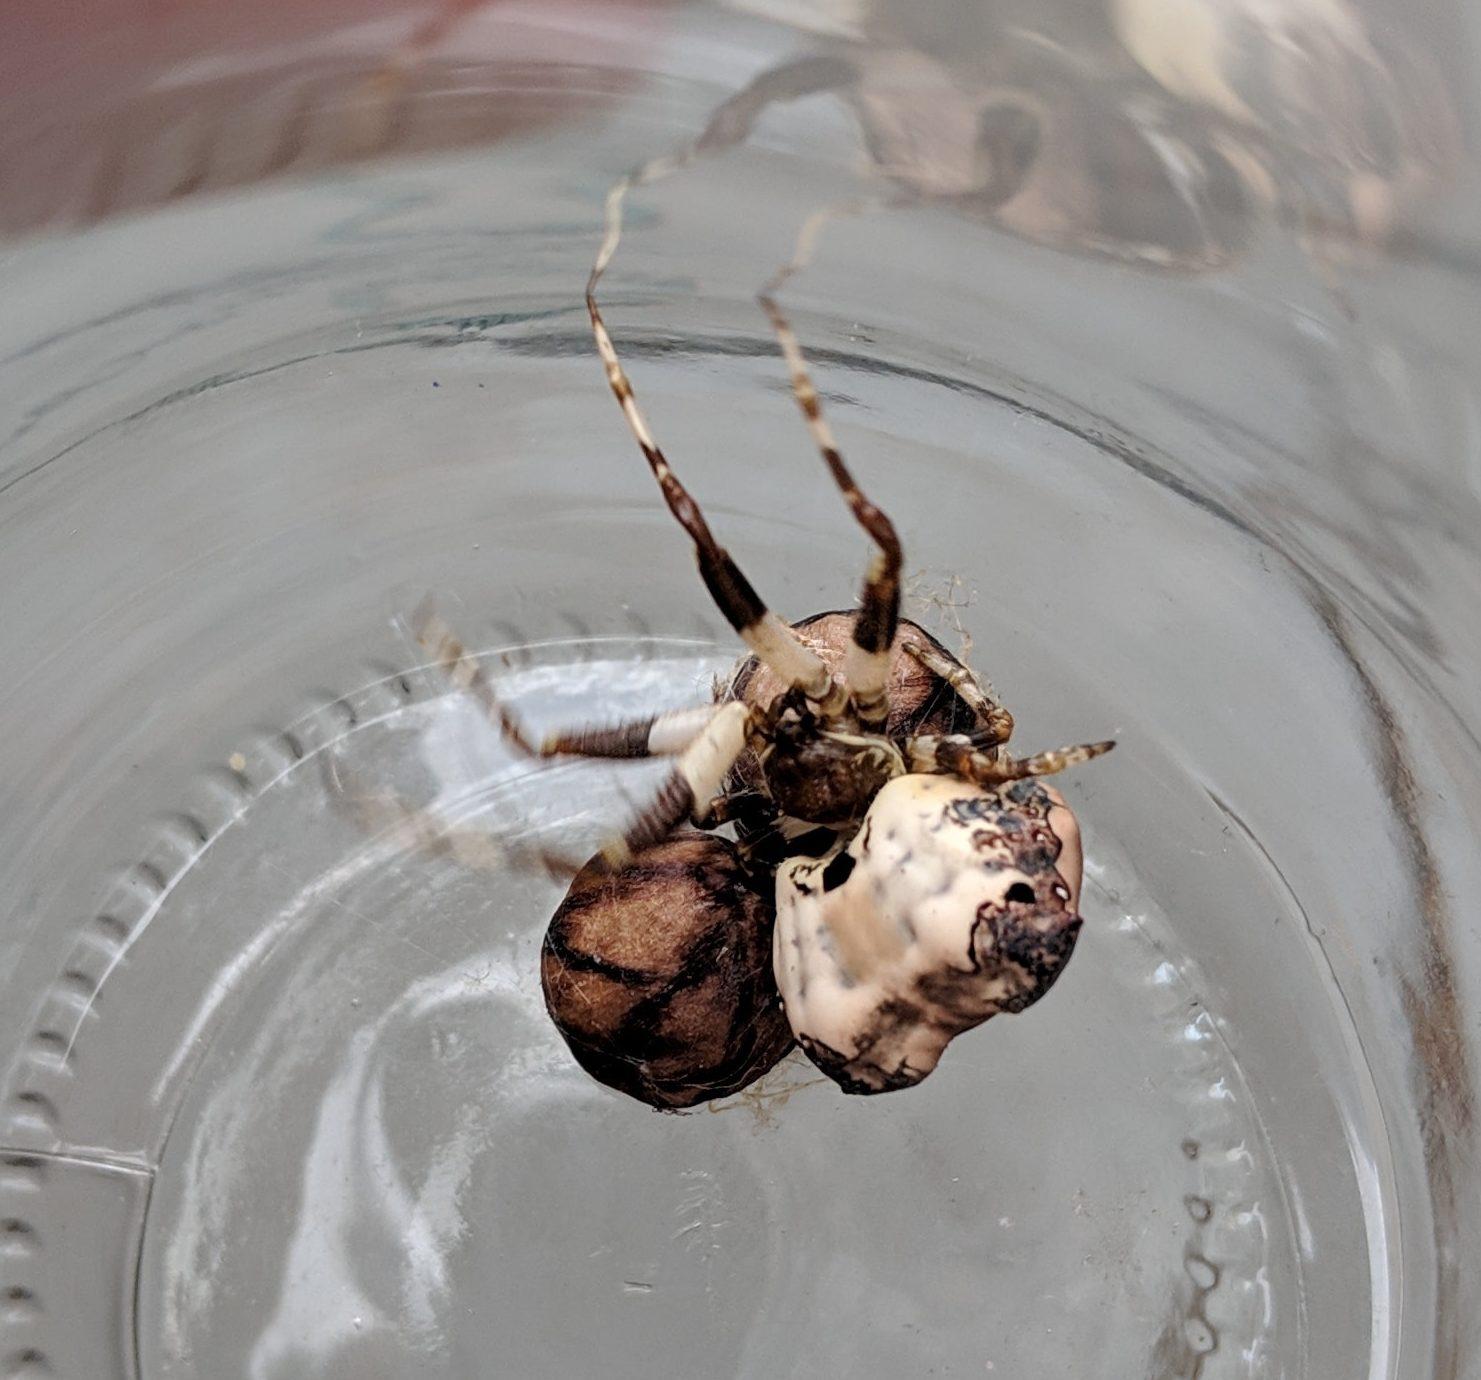 Picture of Celaenia excavata (Bird-dropping Spider) - Female - Dorsal,Egg sacs